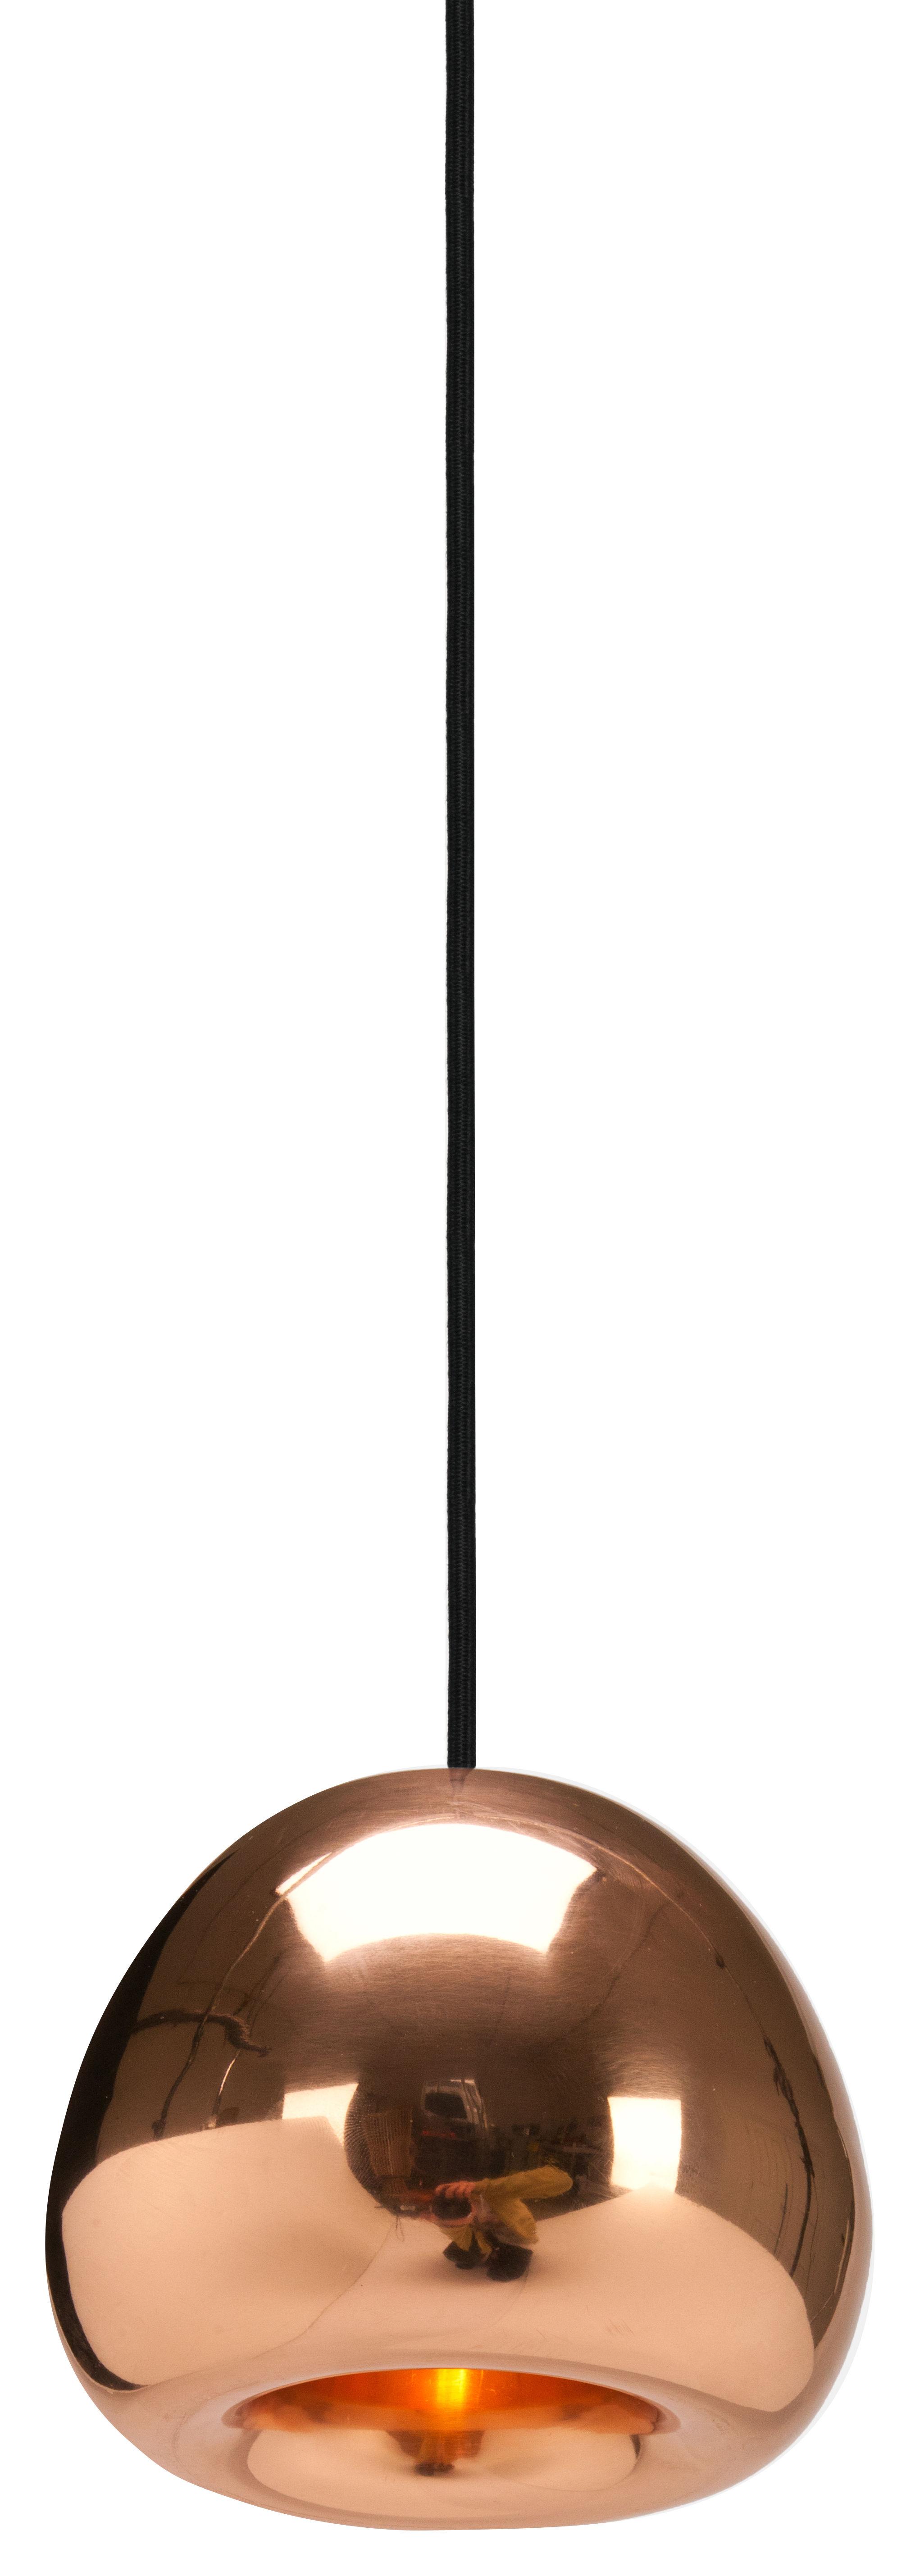 Lighting - Pendant Lighting - Void Mini Pendant - Ø 15,5 cm by Tom Dixon - Copper - Polished copper